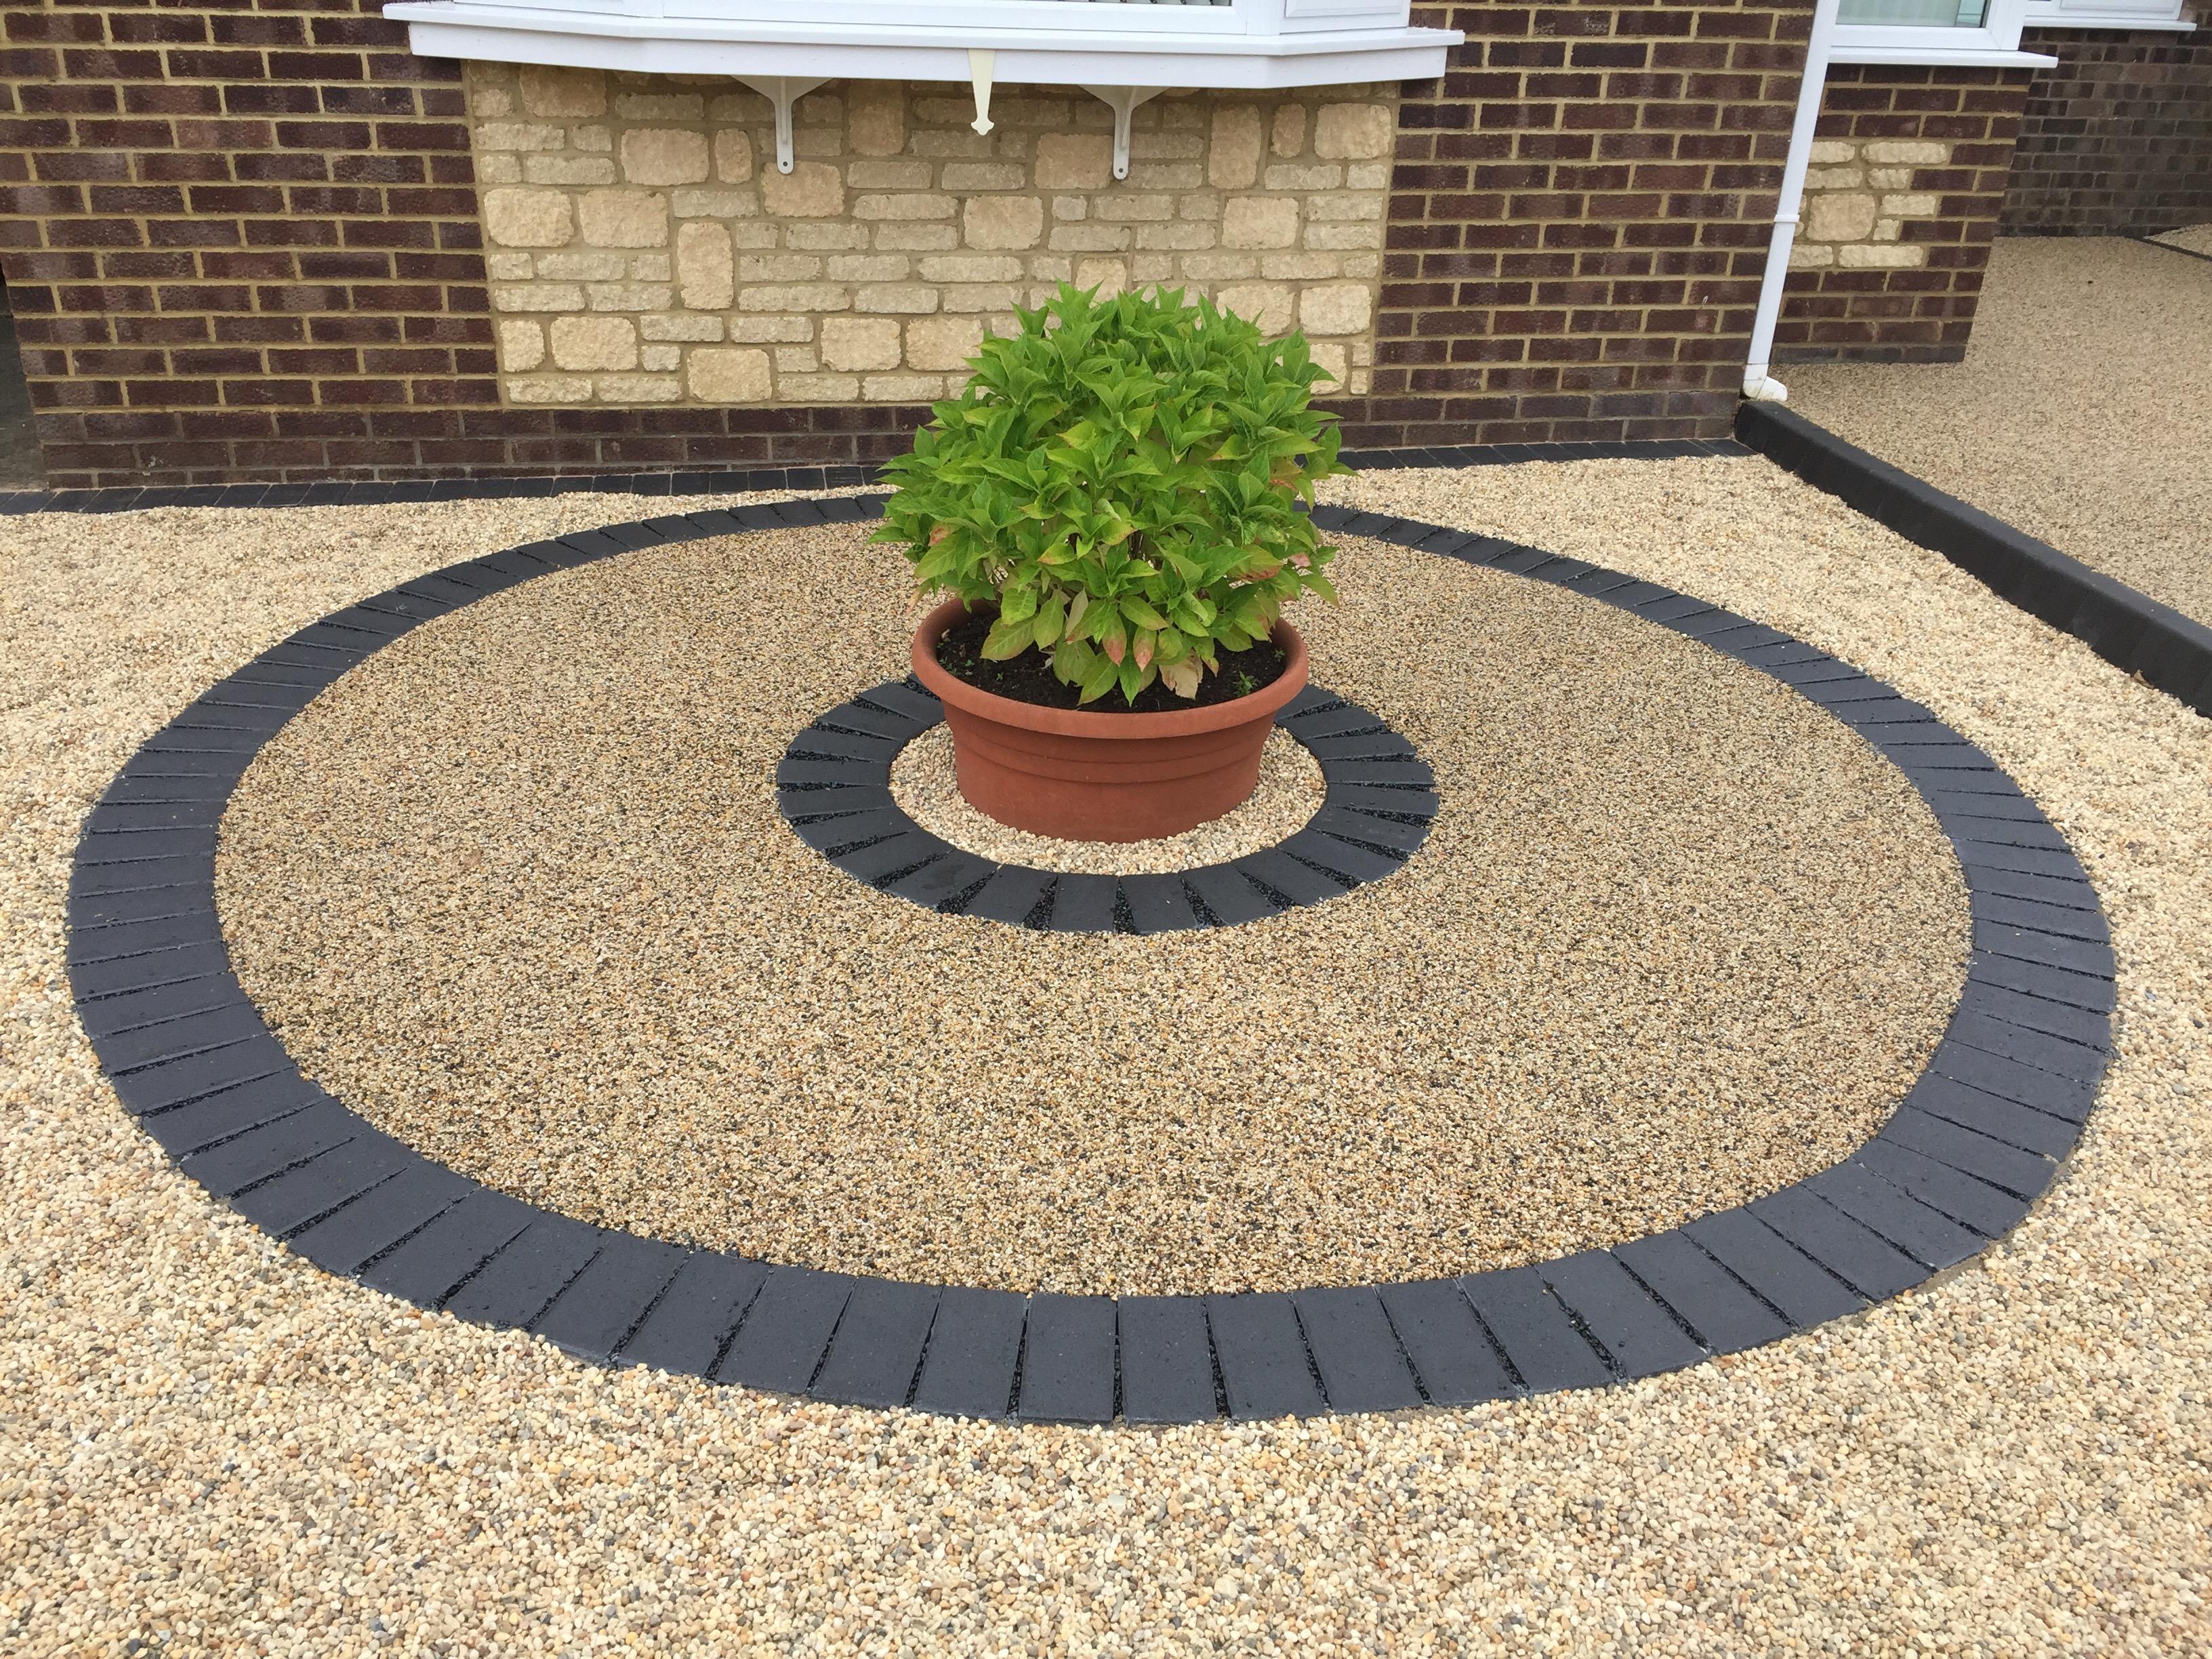 Decorative Circle in Resin and Blocks